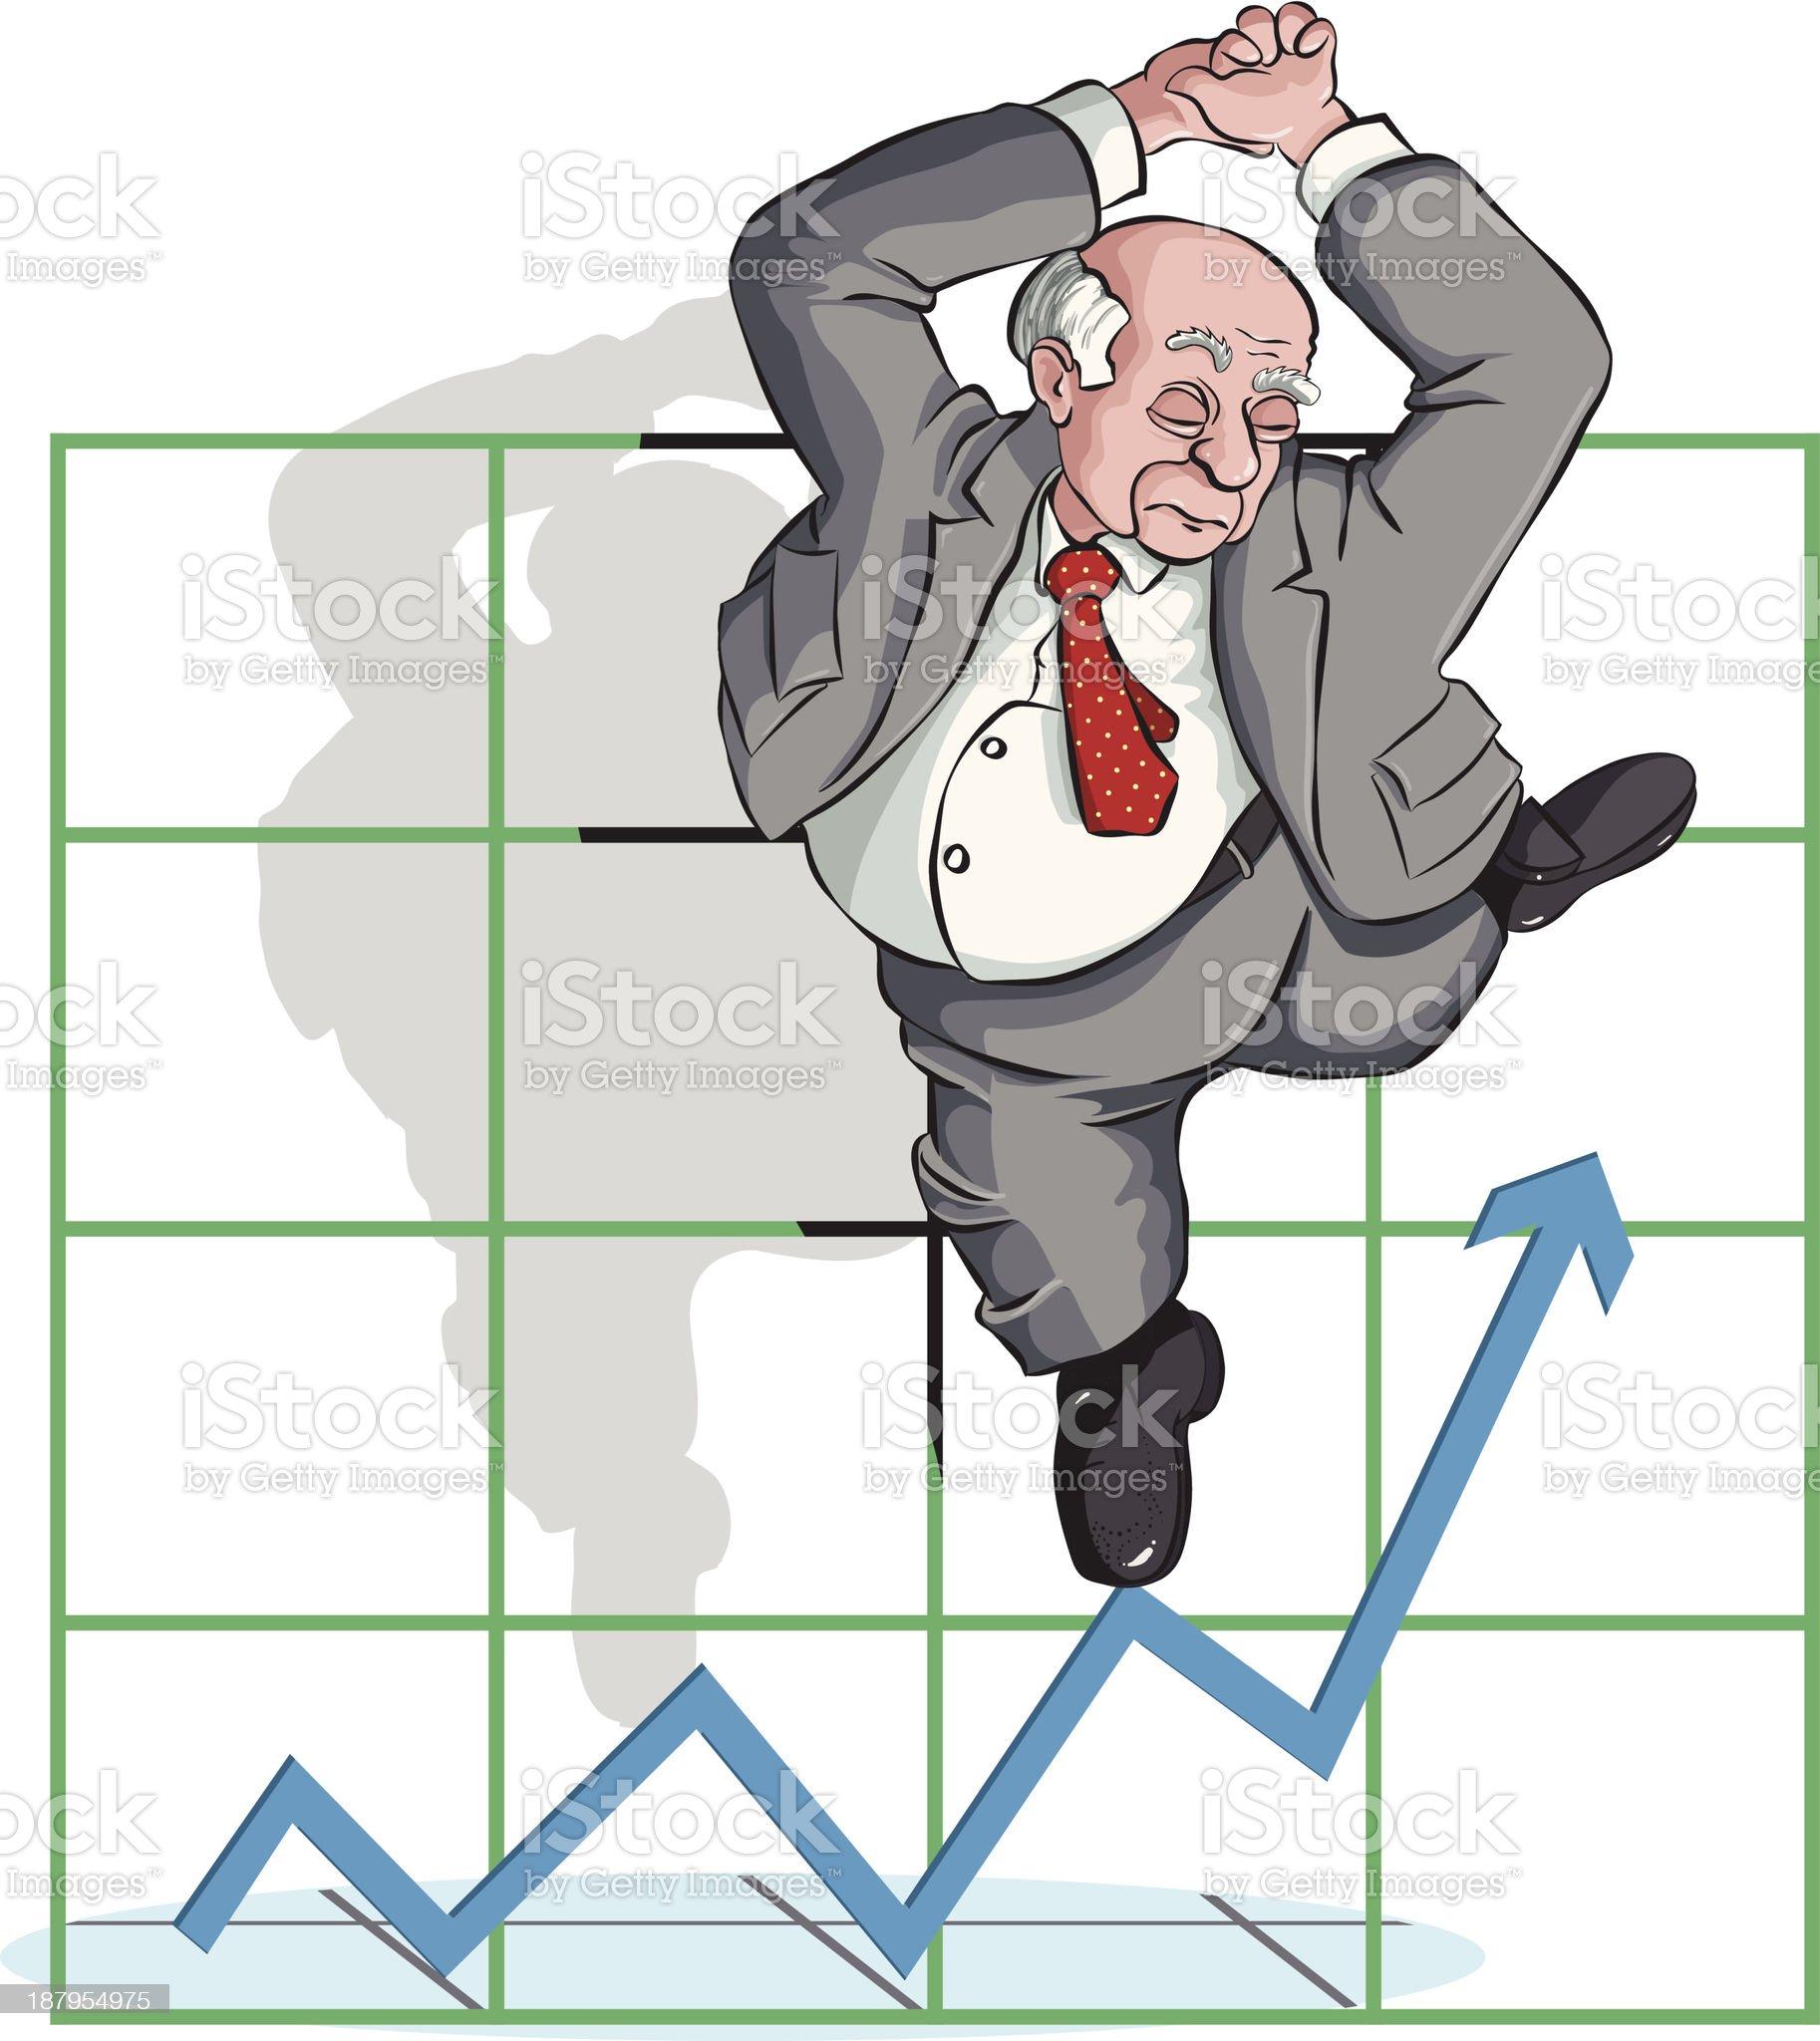 Financial Performance royalty-free stock vector art